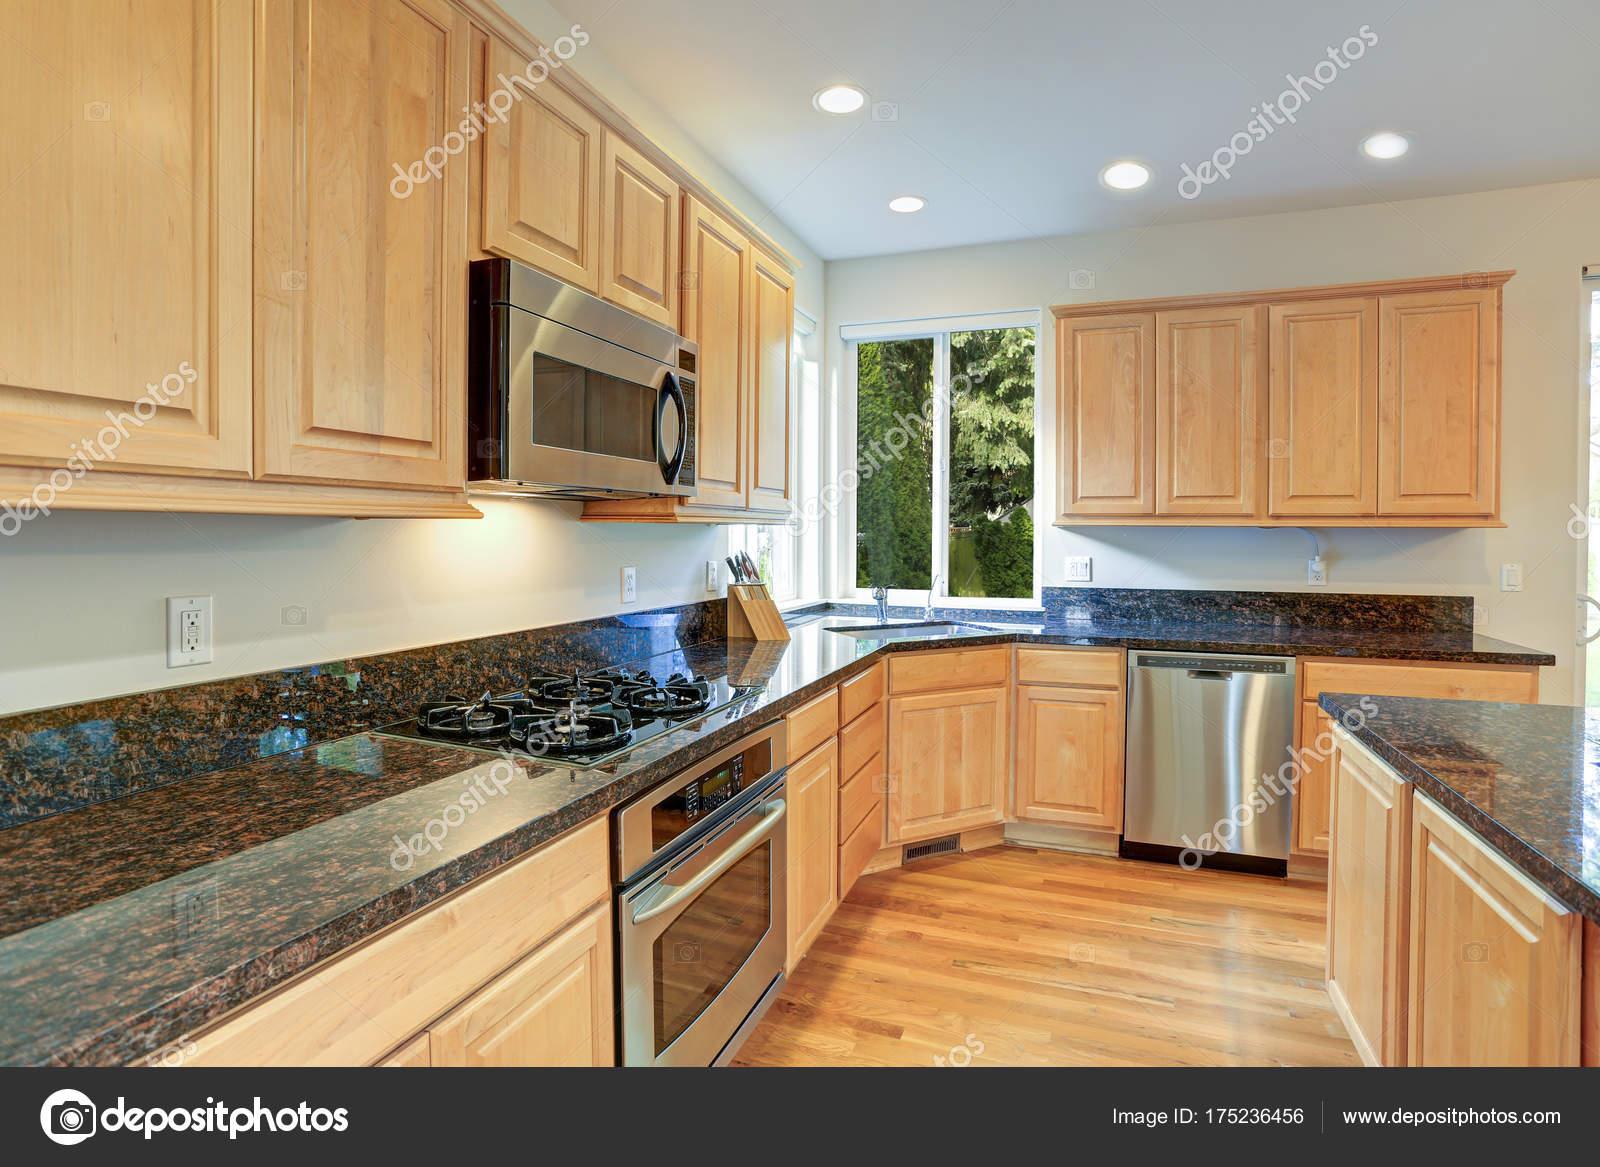 k che edelstahl holz sp len unterschrank k che arbeitsplatte edelstahl wandtattoo peperoni ikea. Black Bedroom Furniture Sets. Home Design Ideas